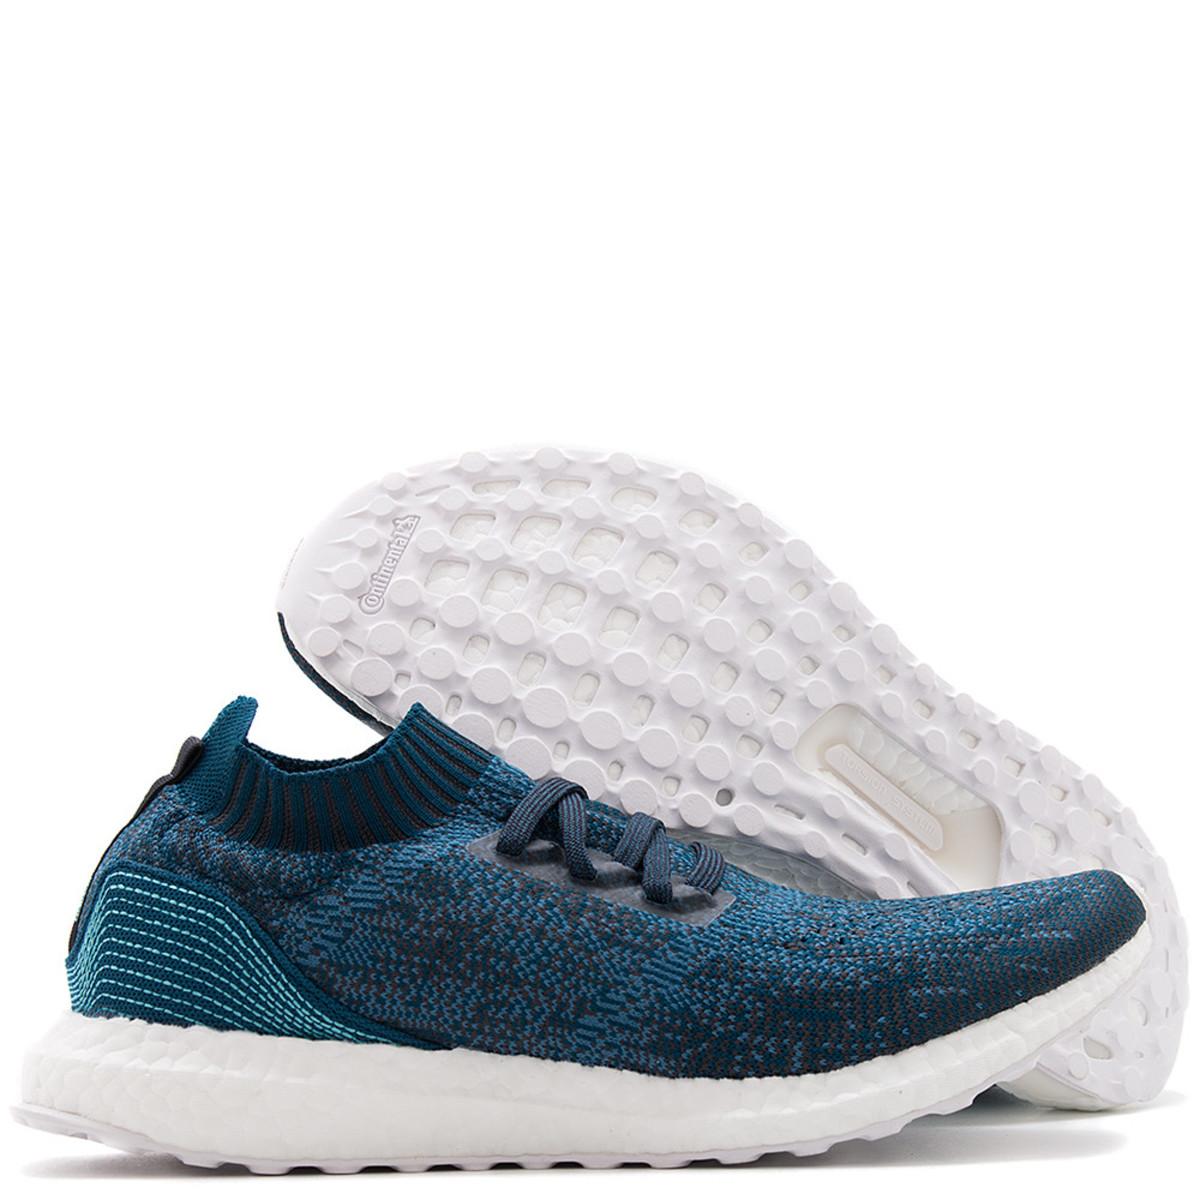 25297c5d85e57 Adidas x Parley Ultraboost Uncaged - Blue